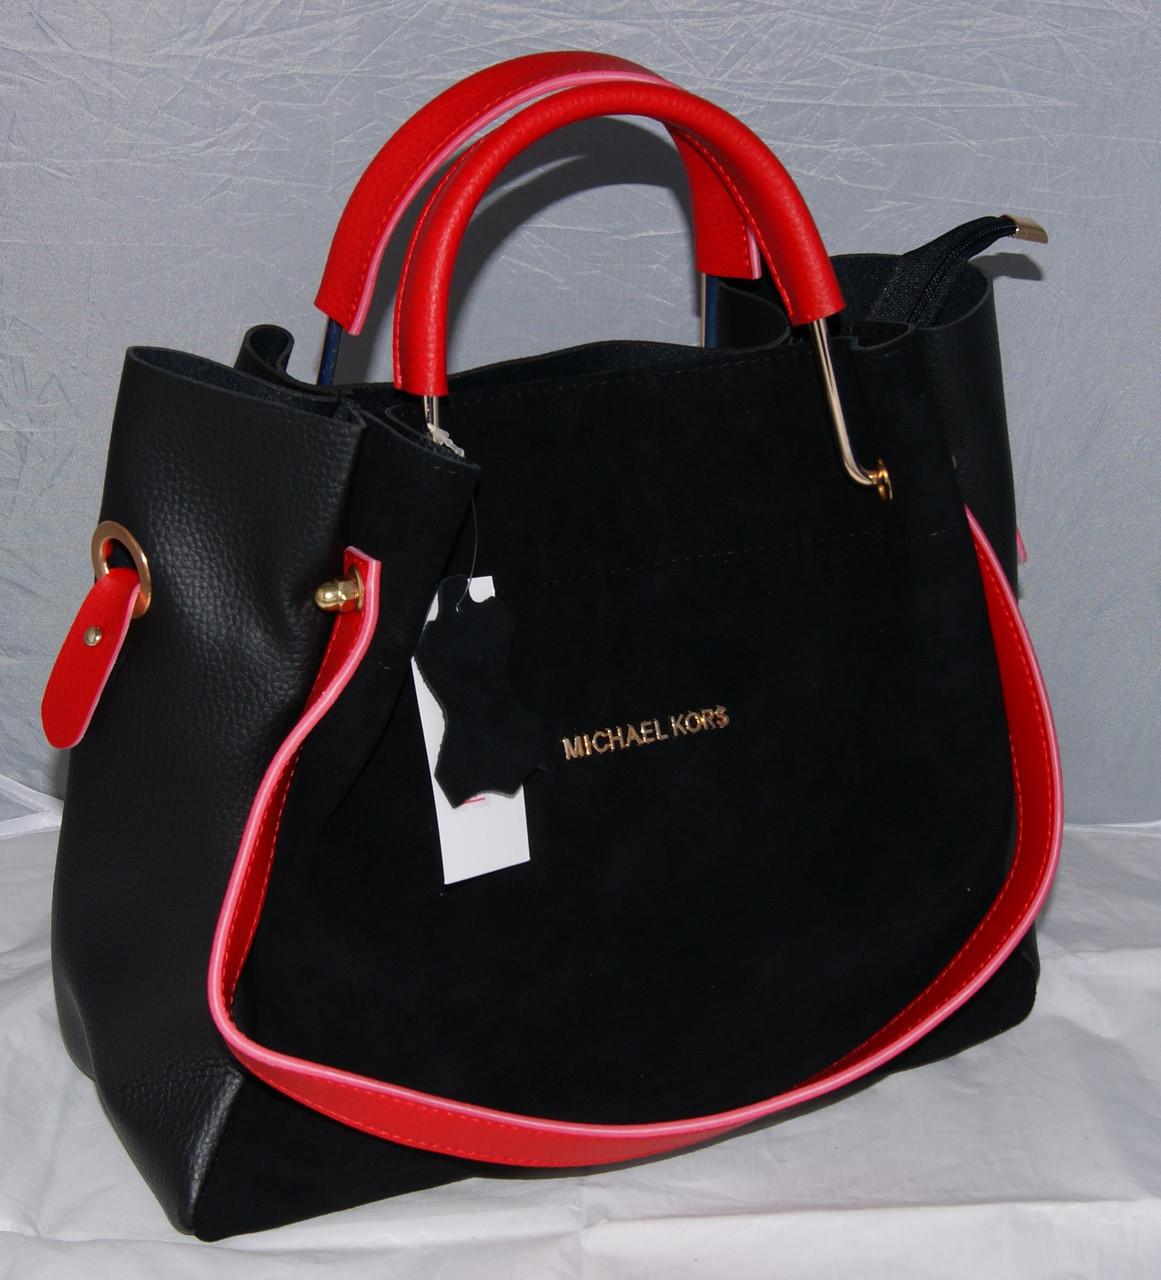 377e50d76c30 Женская черная замшевая сумка-шопер Michael Kors, MK, Майкл Корс с красными  ручками